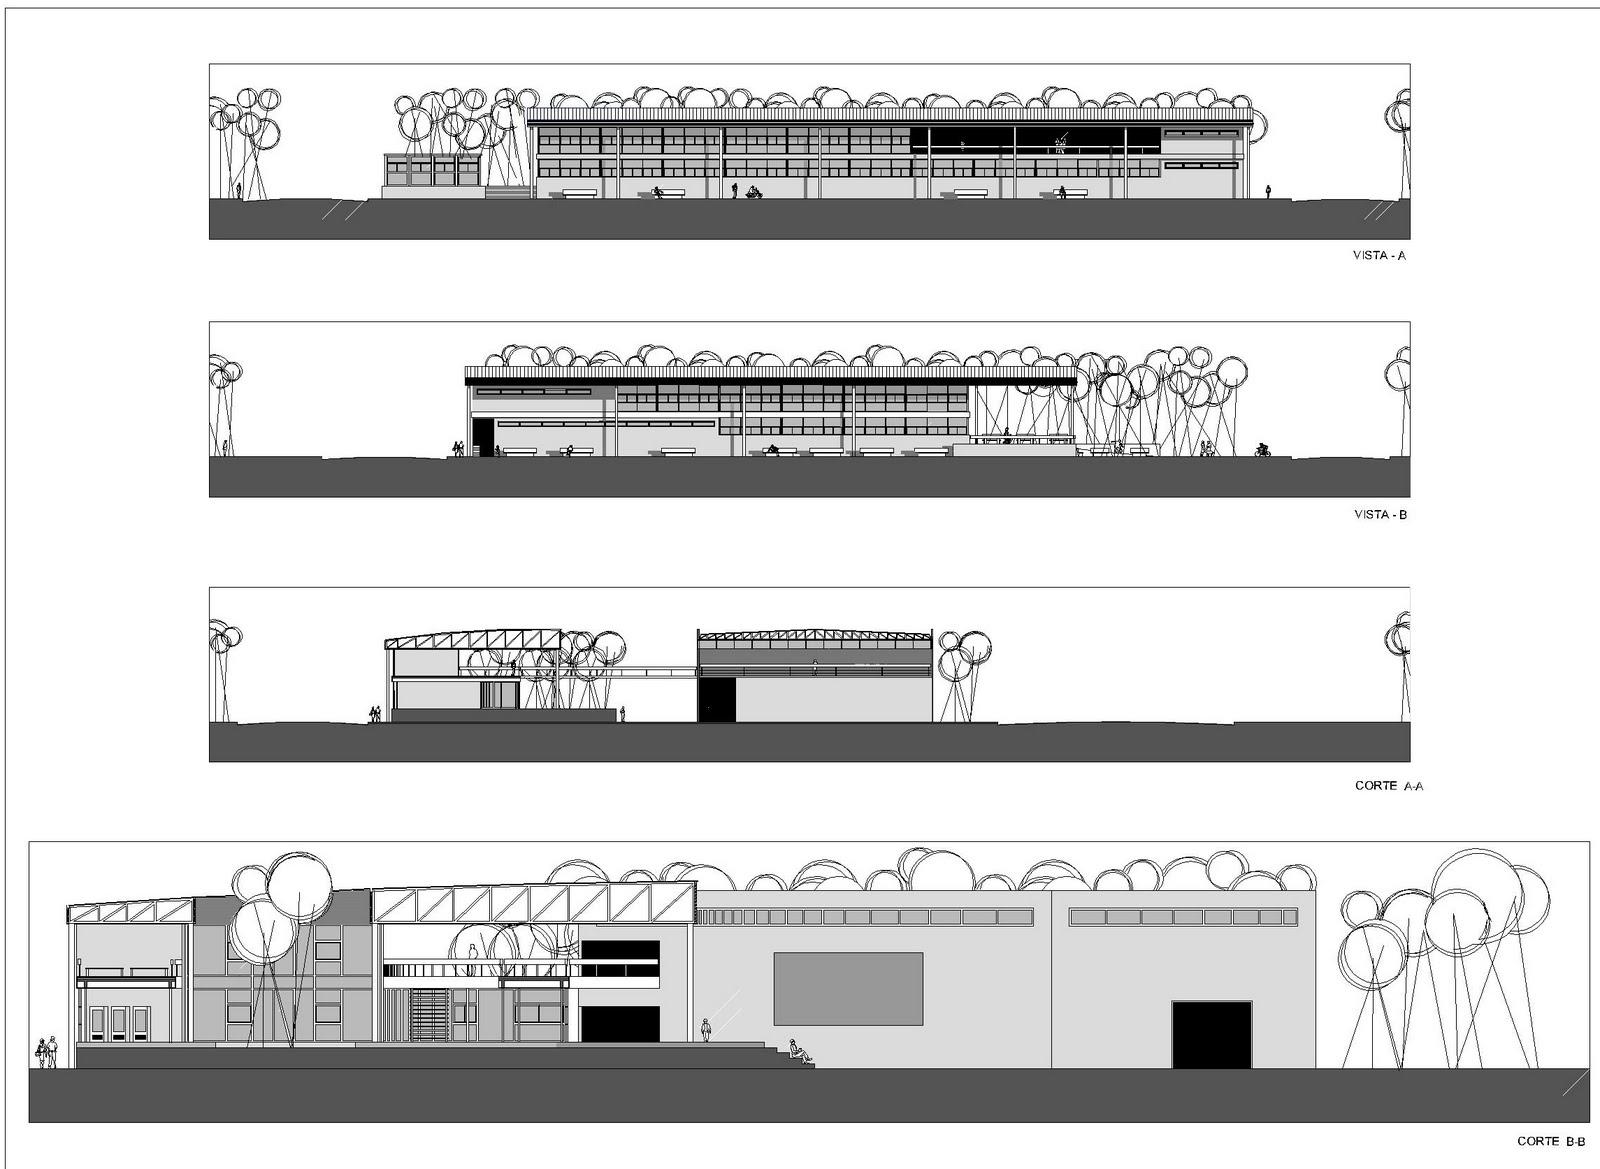 Arquitectura fadu dise o 3 catedra molina y vedia for Arquitectura y diseno las palmas